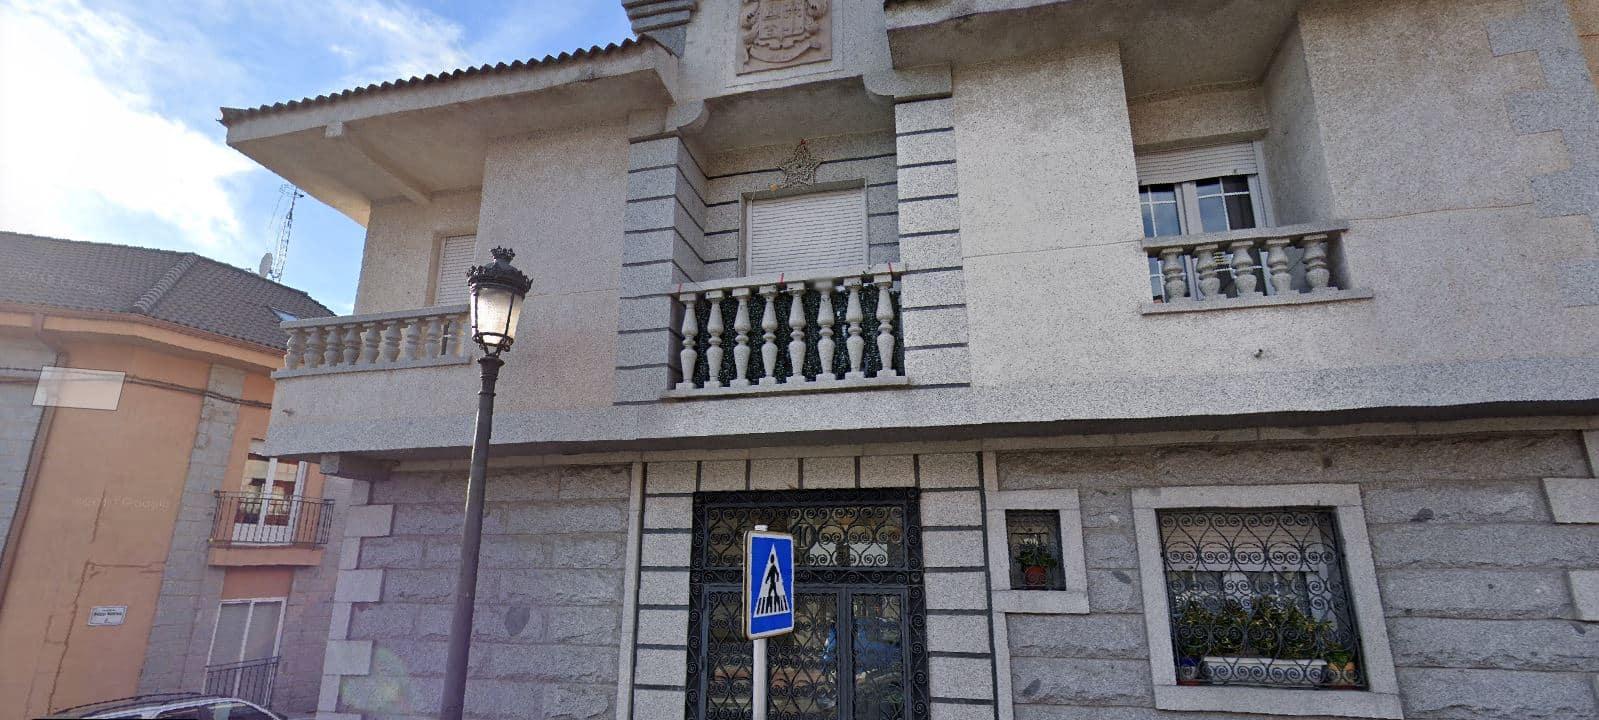 Registro civil - Juzgado de Paz Alpedrete